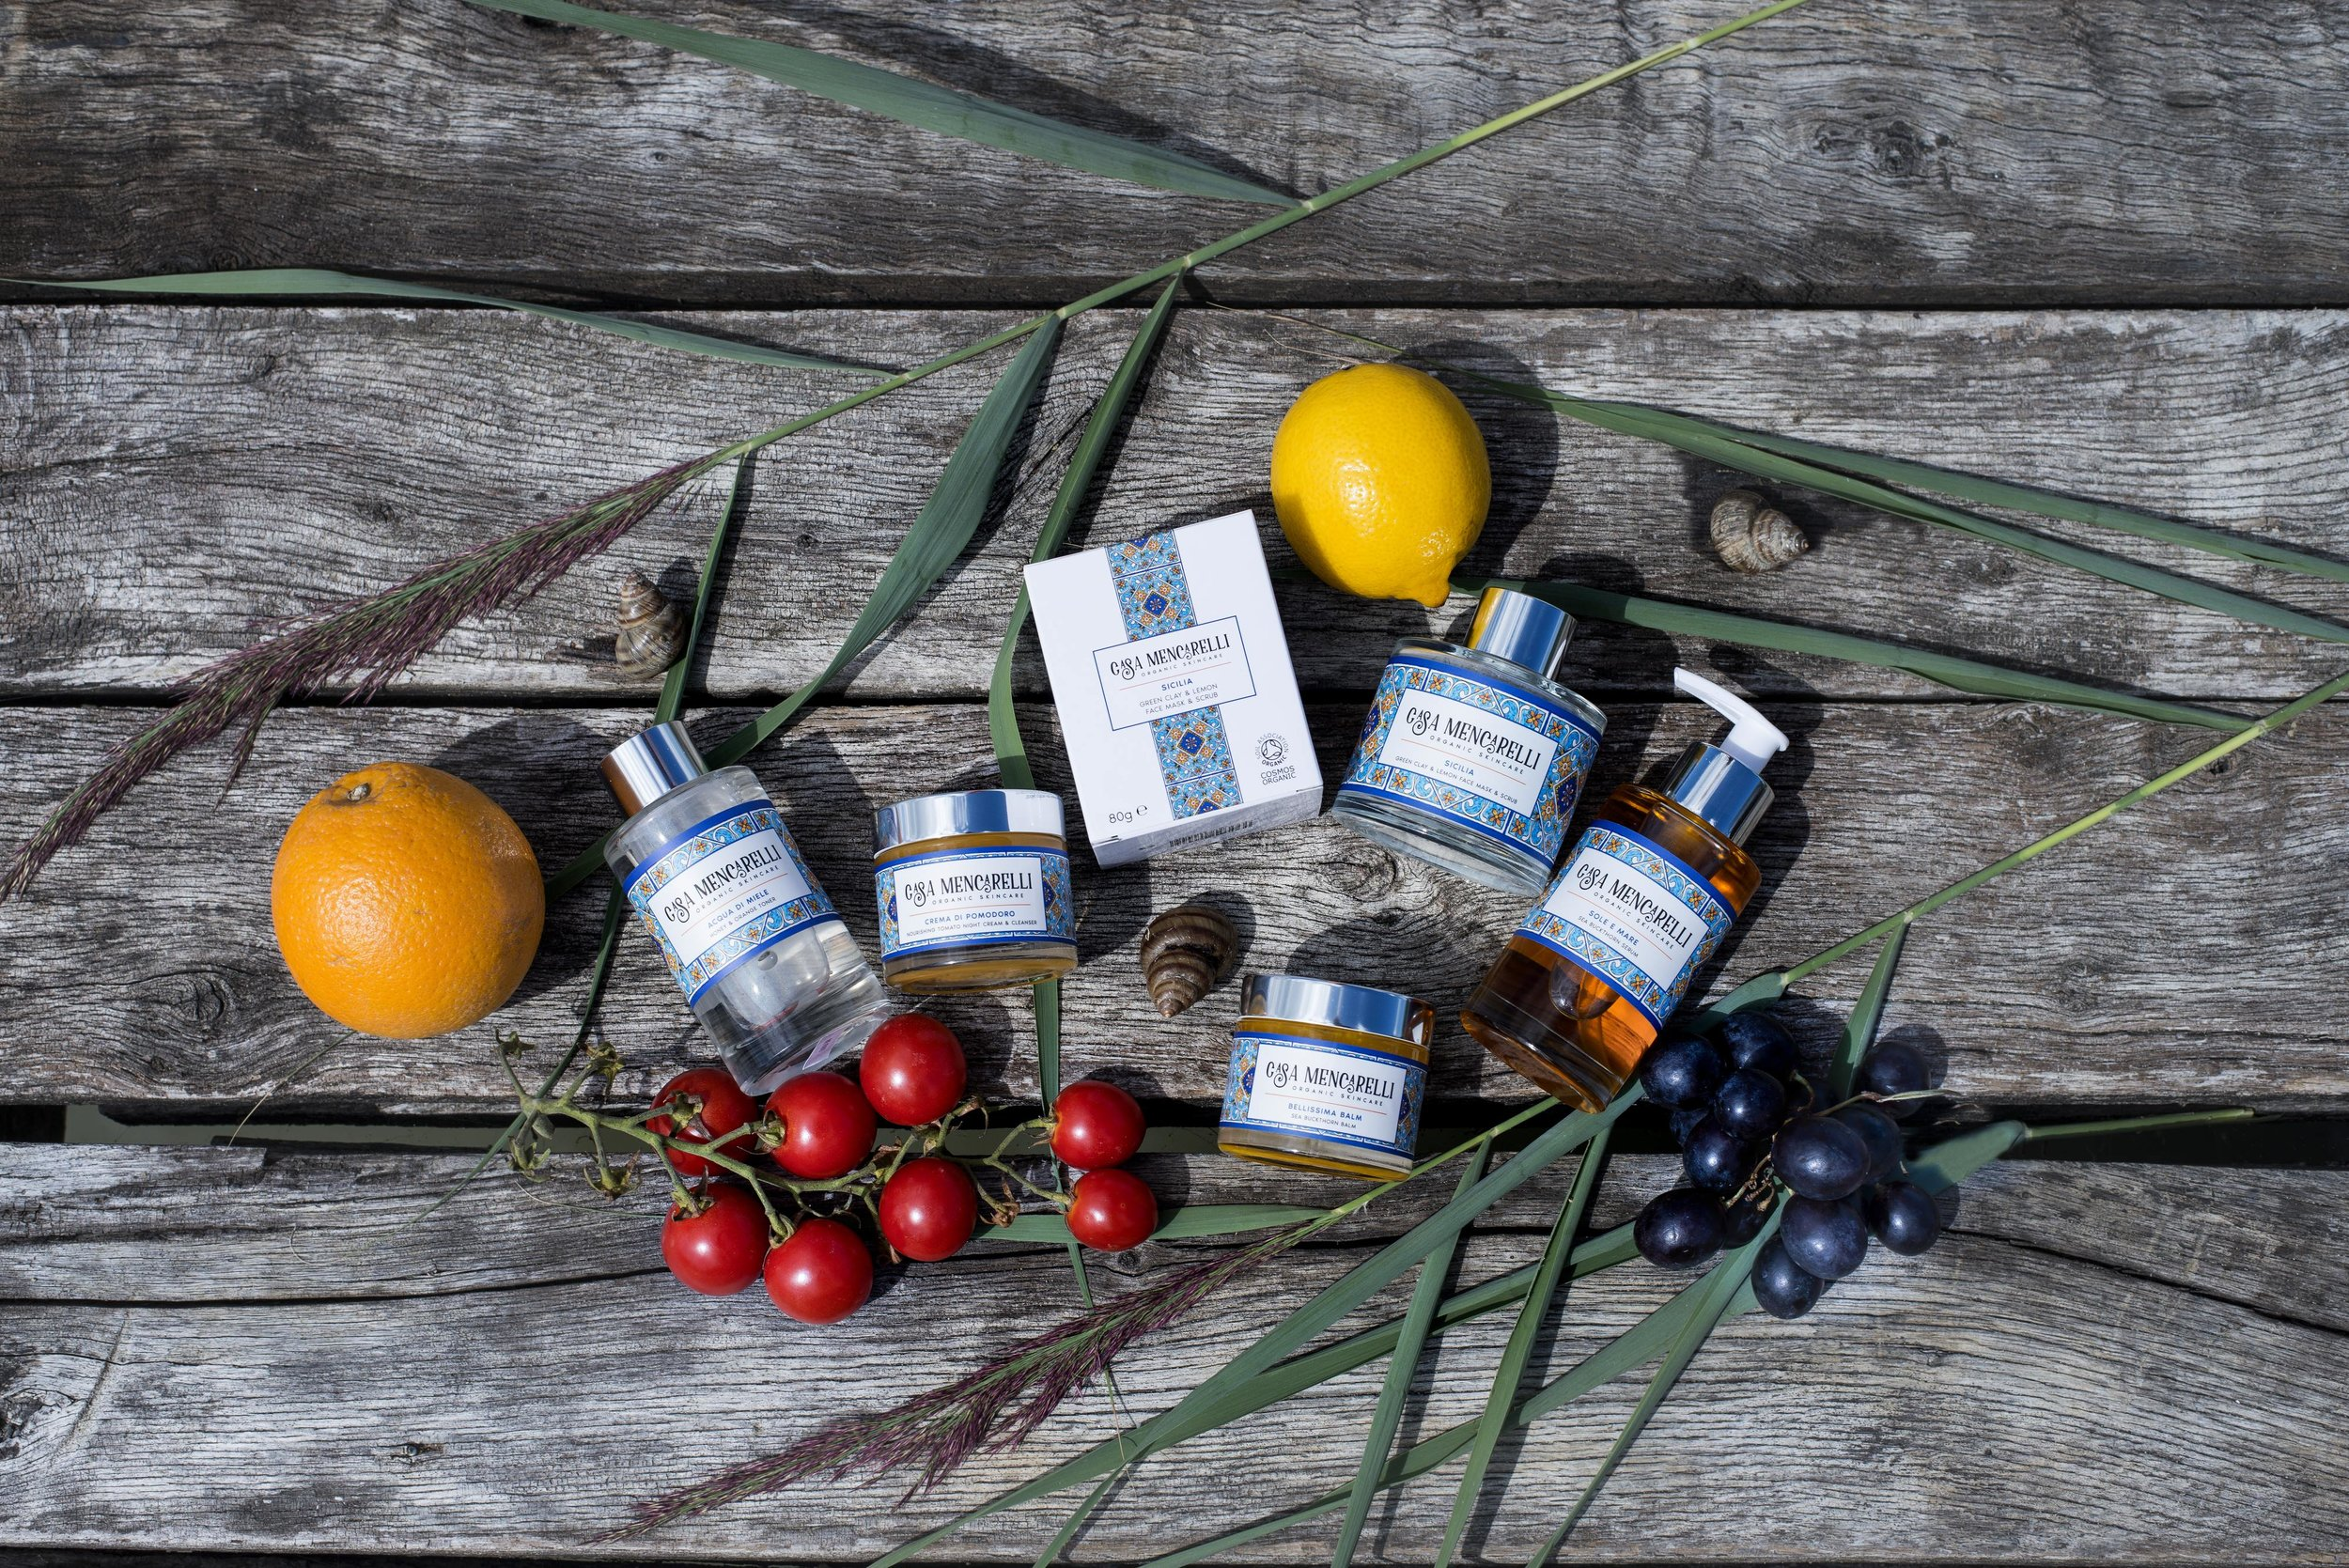 Casa Mencarelli Products